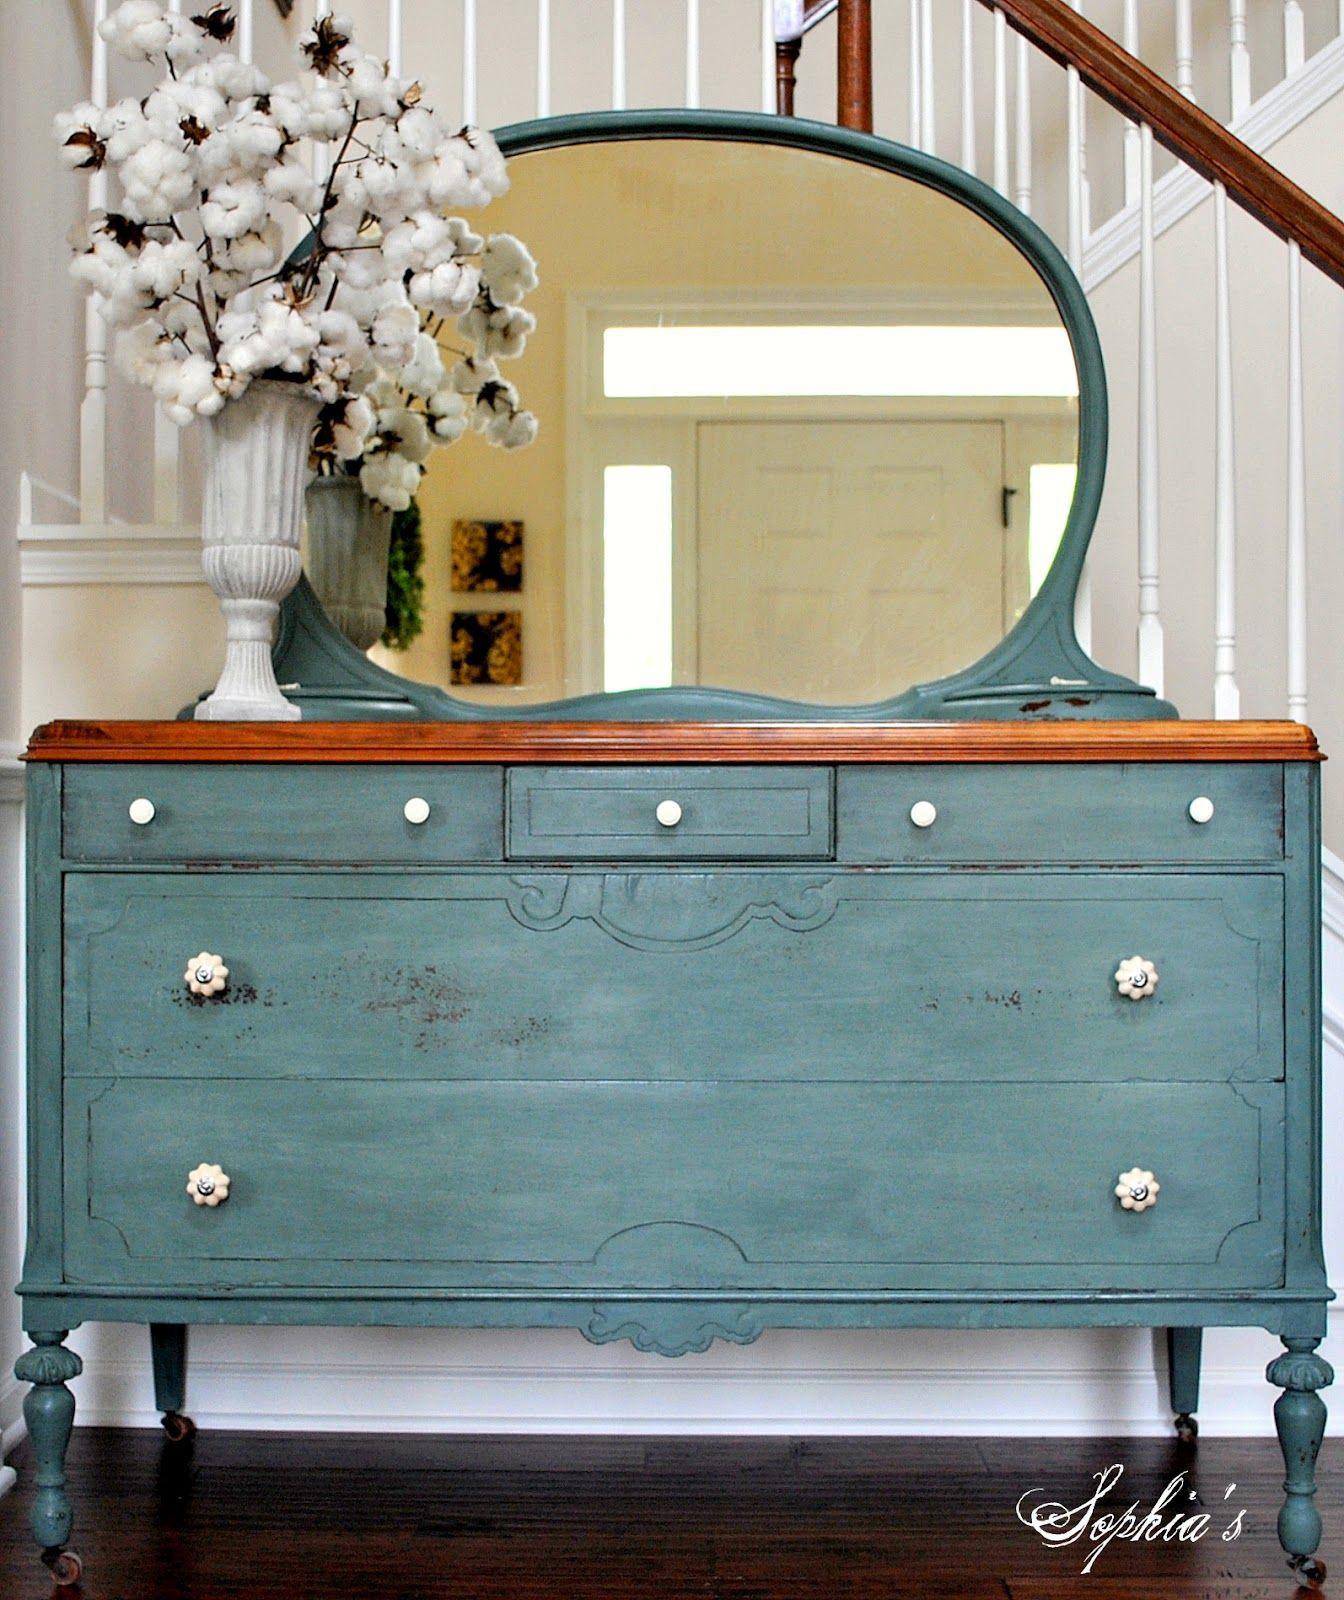 Sophia S Milk Paint Dresser Home Goods Decor Furniture Painted Furniture